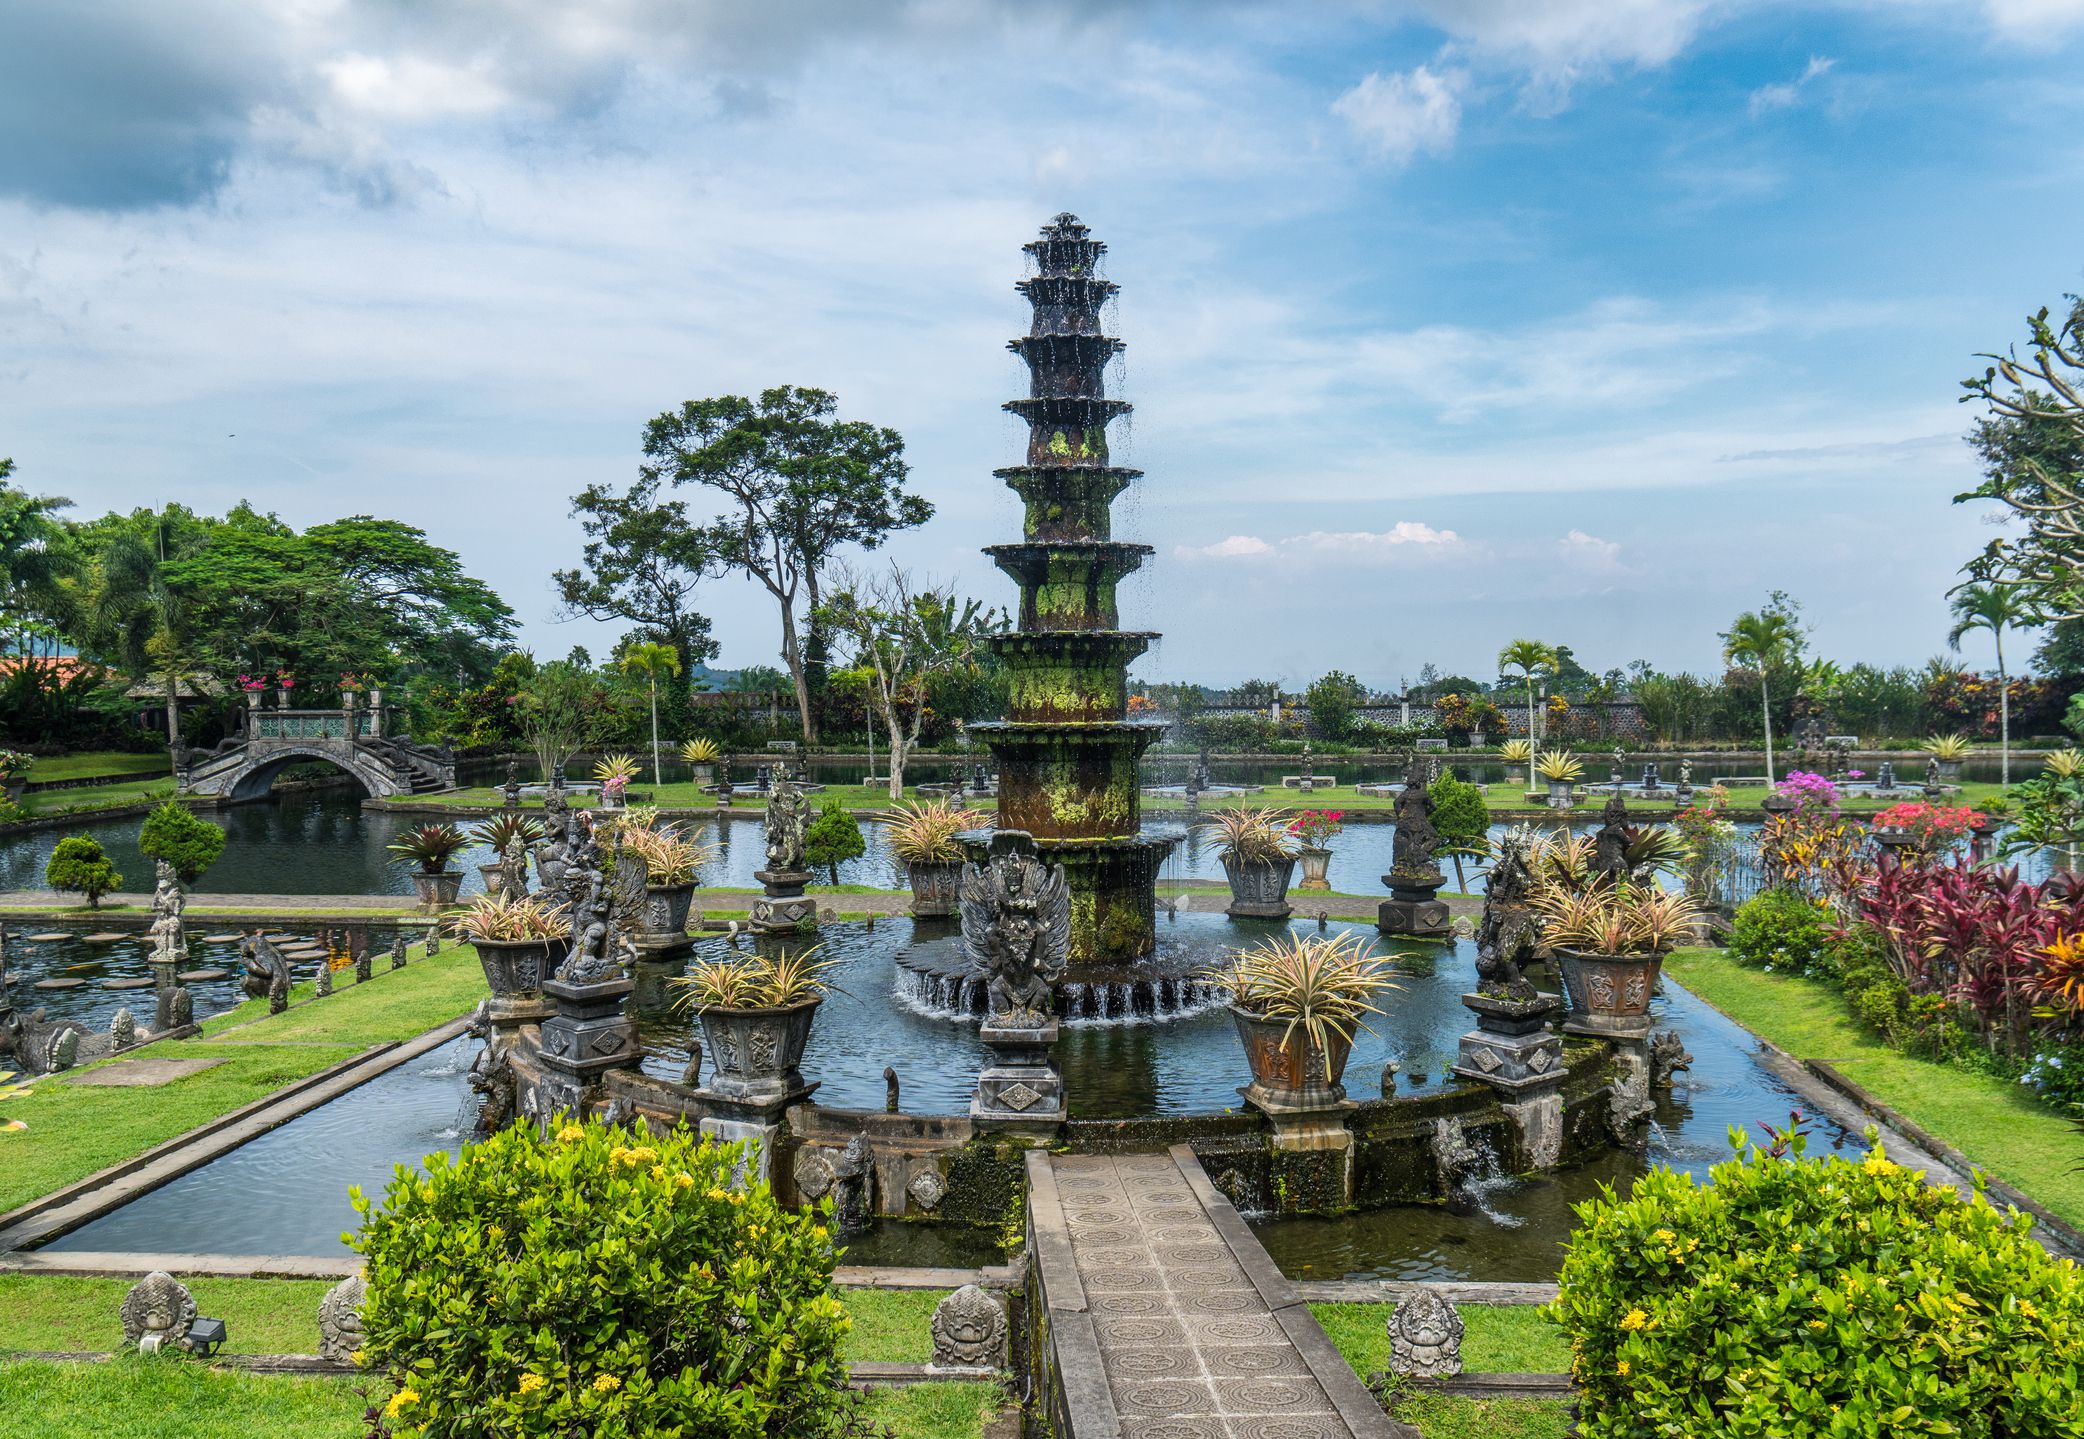 Water fall statue and pond at Tirta Gangga Water temple